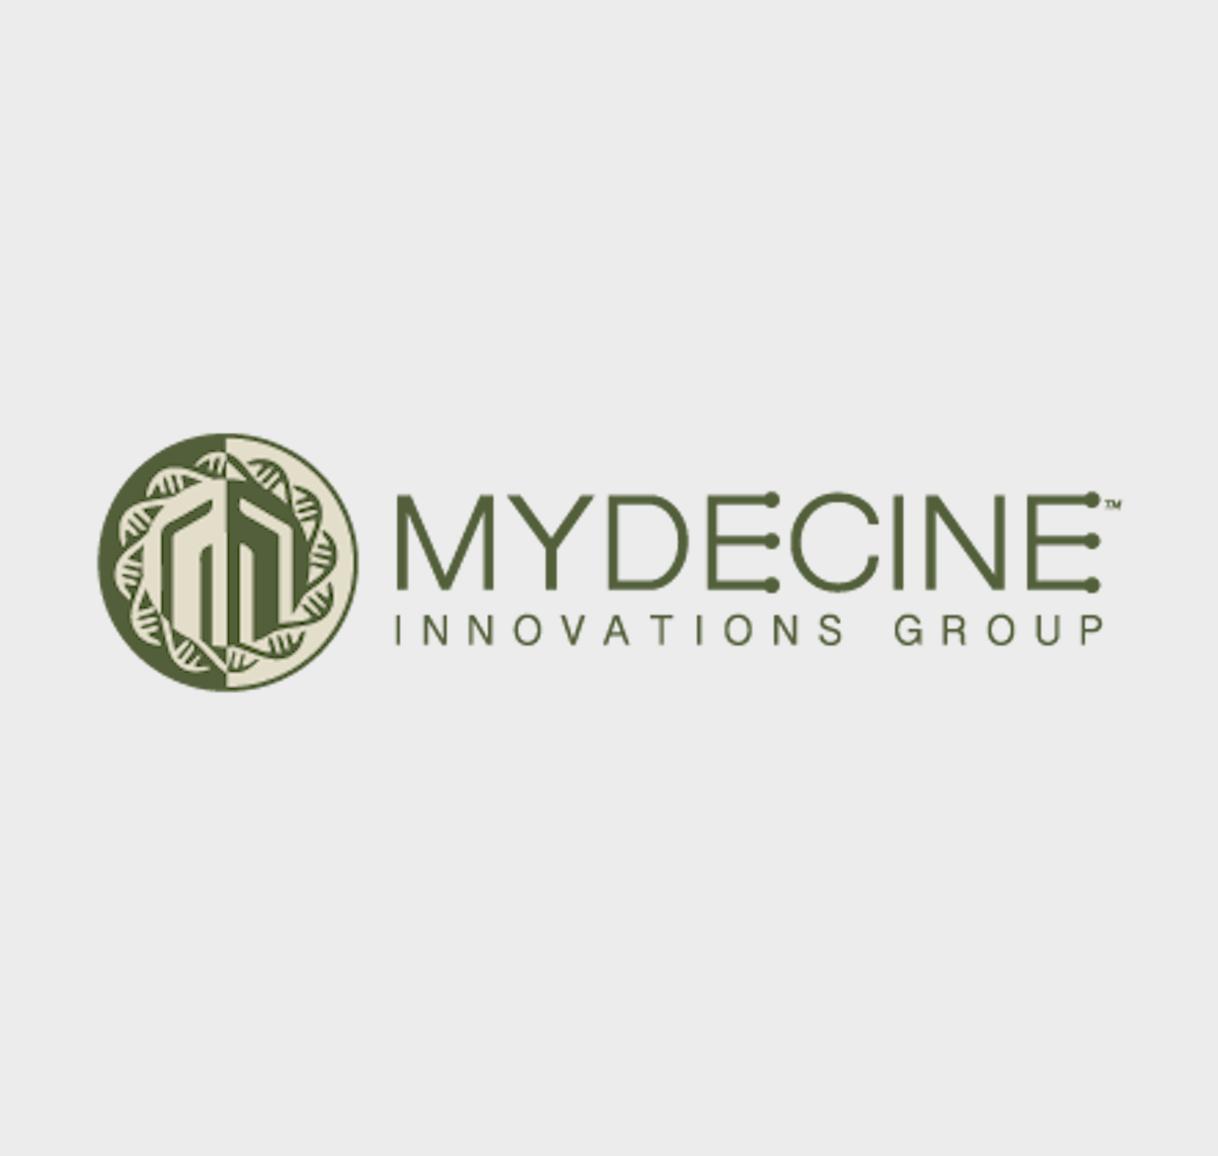 Mydecine Innovations Group